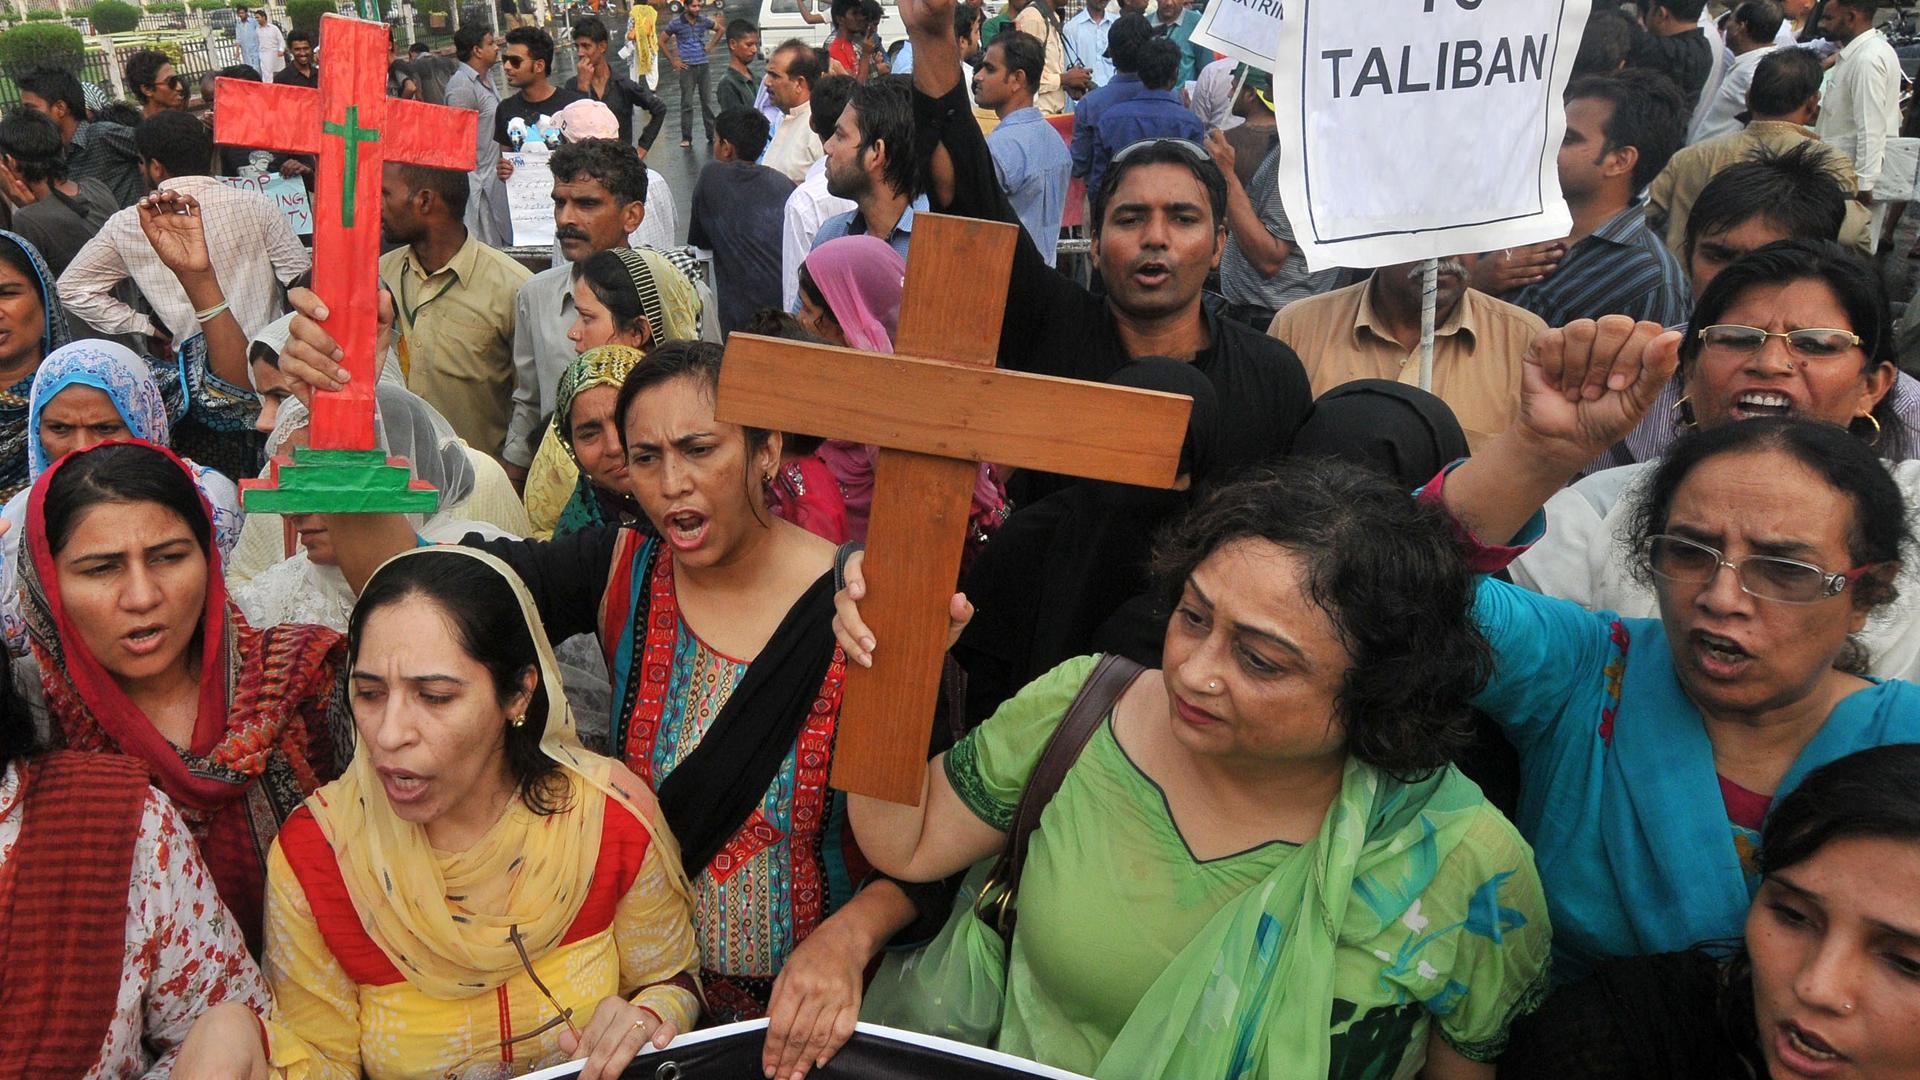 Image: PAKISTAN-UNREST-ATTACKS-CHRISTIAN